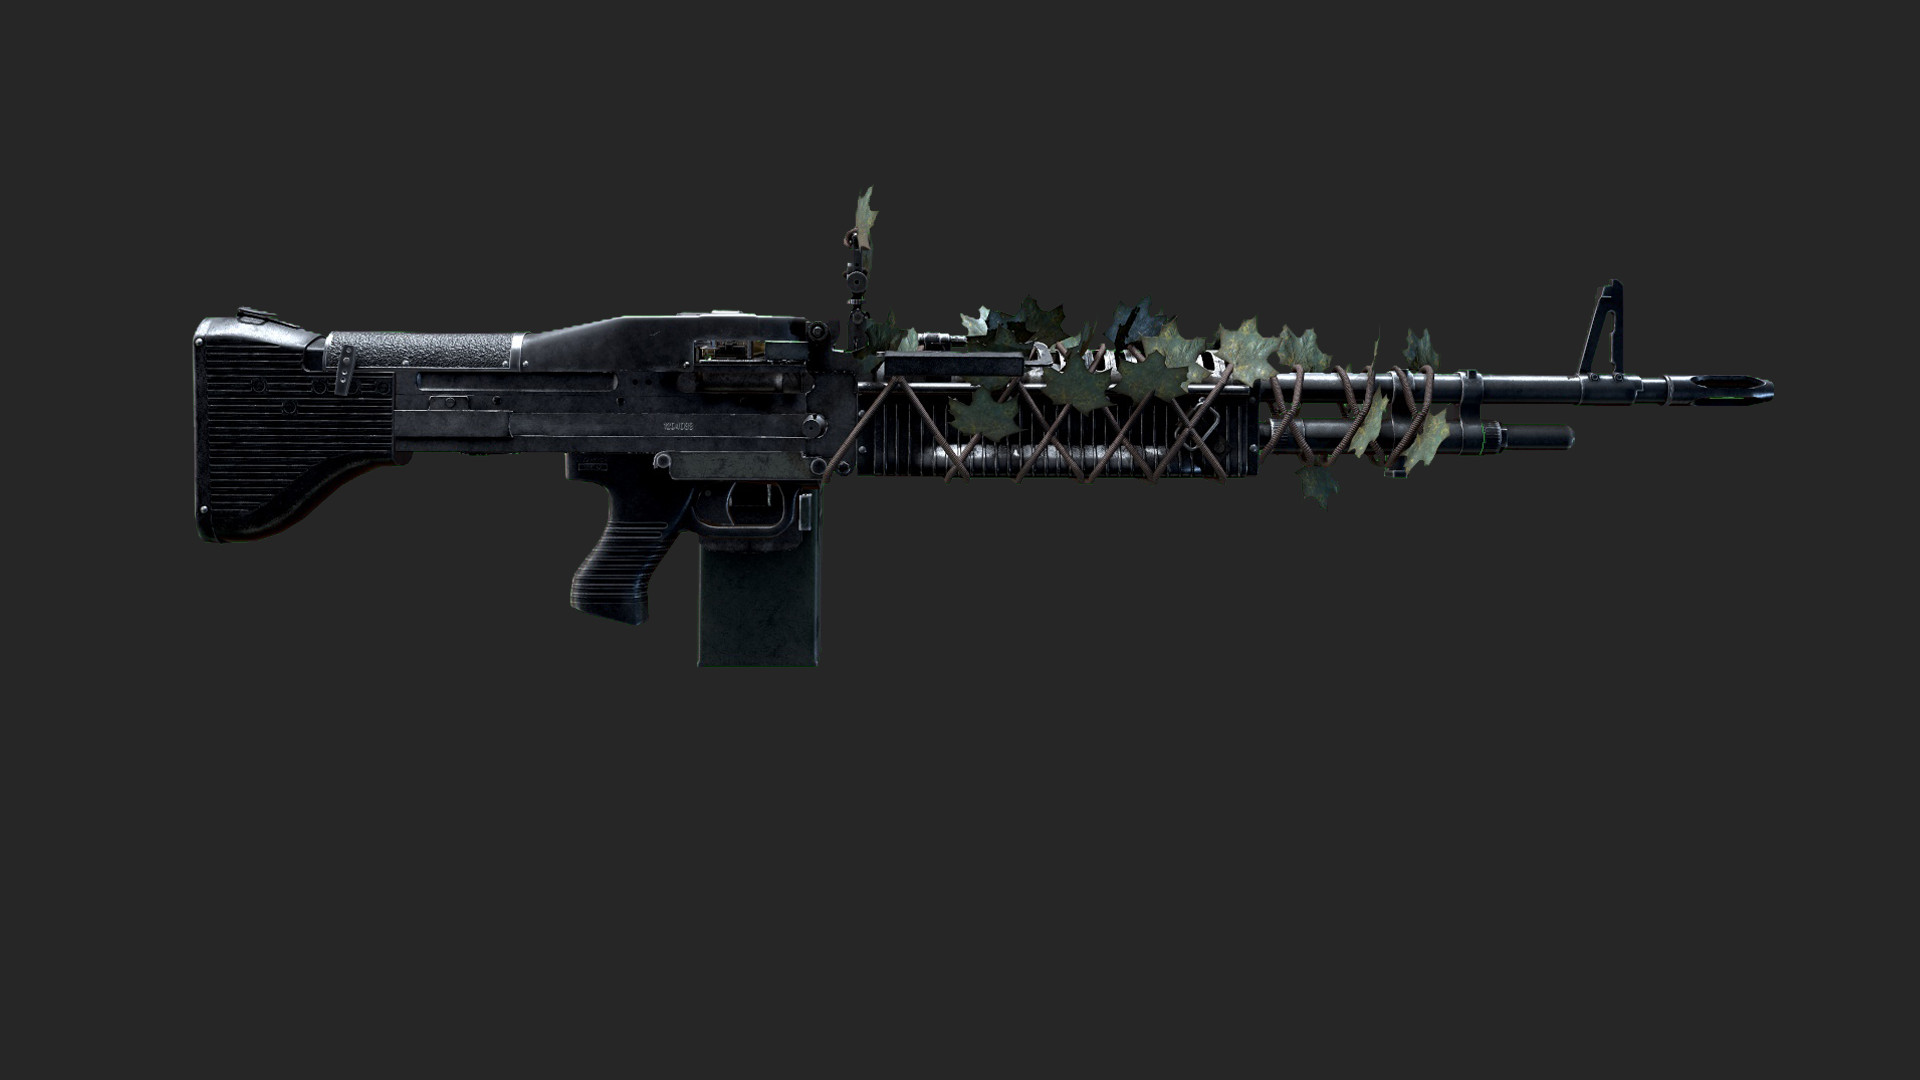 PAYDAY 2: Fugitive Weapon Pack Fiyat Karşılaştırma